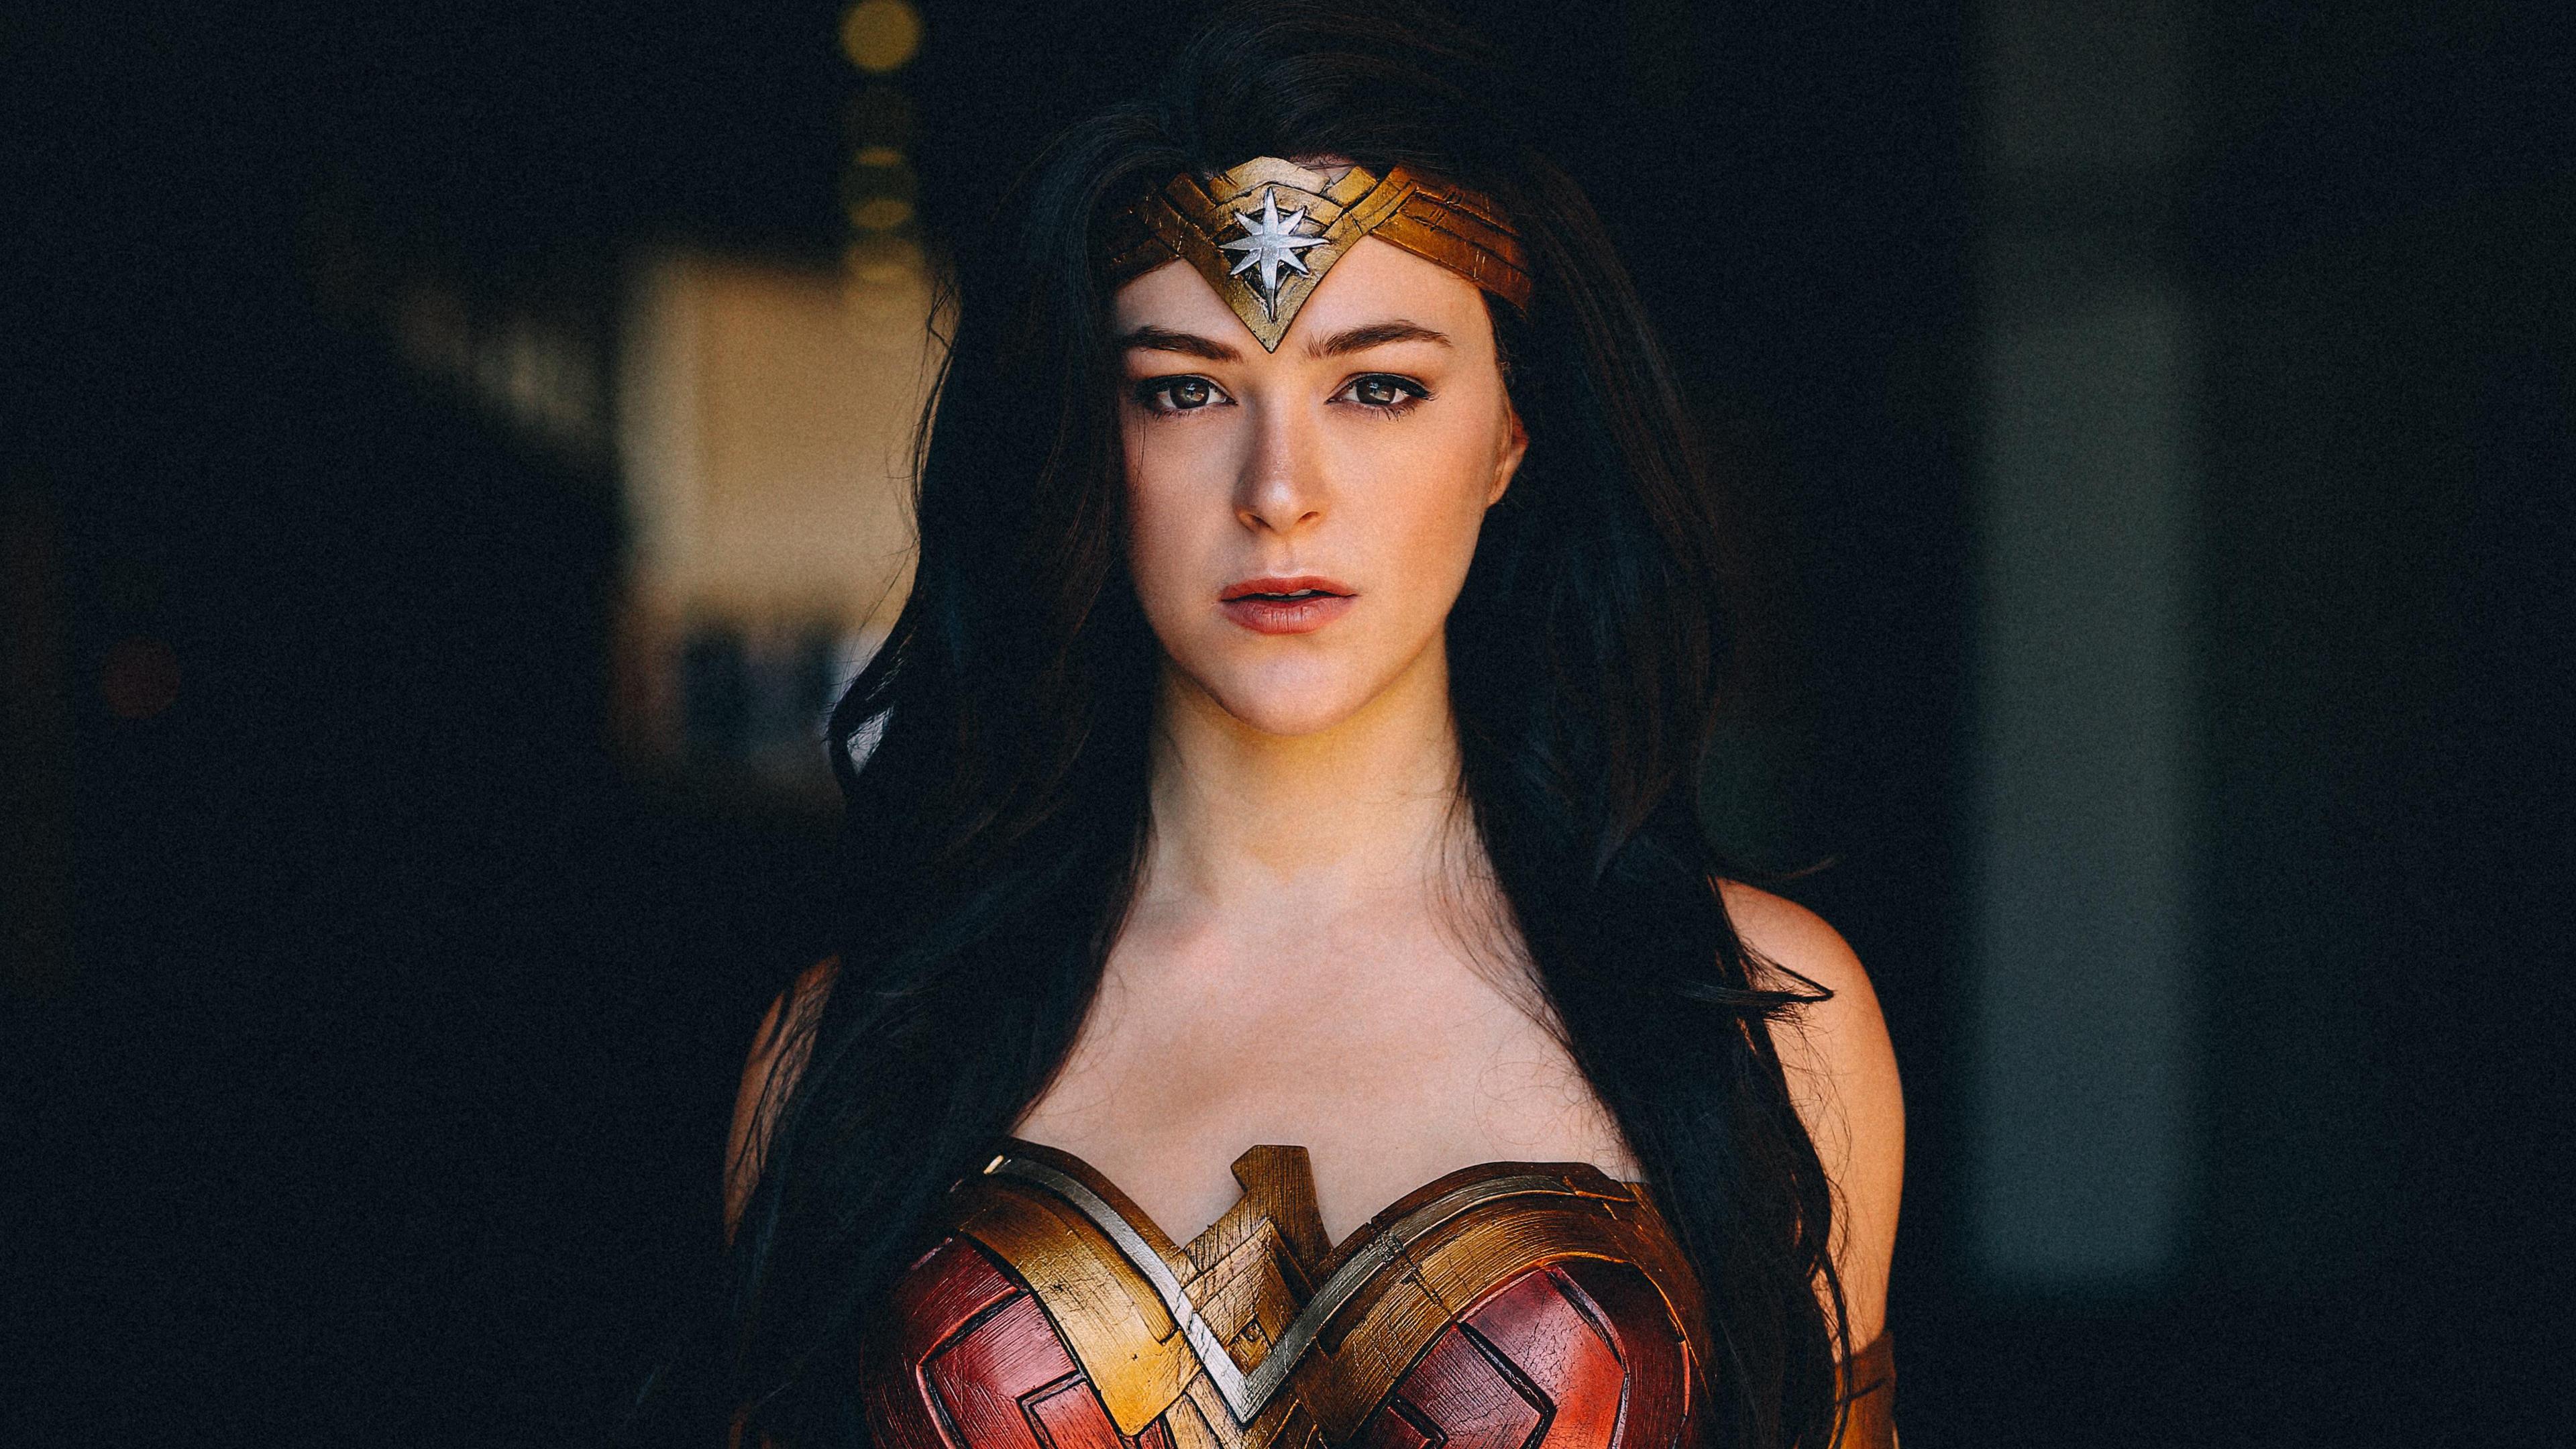 cosplay wonder woman 4k 1553072031 - Cosplay Wonder Woman 4k - wonder woman wallpapers, superheroes wallpapers, hd-wallpapers, cosplay wallpapers, 5k wallpapers, 4k-wallpapers